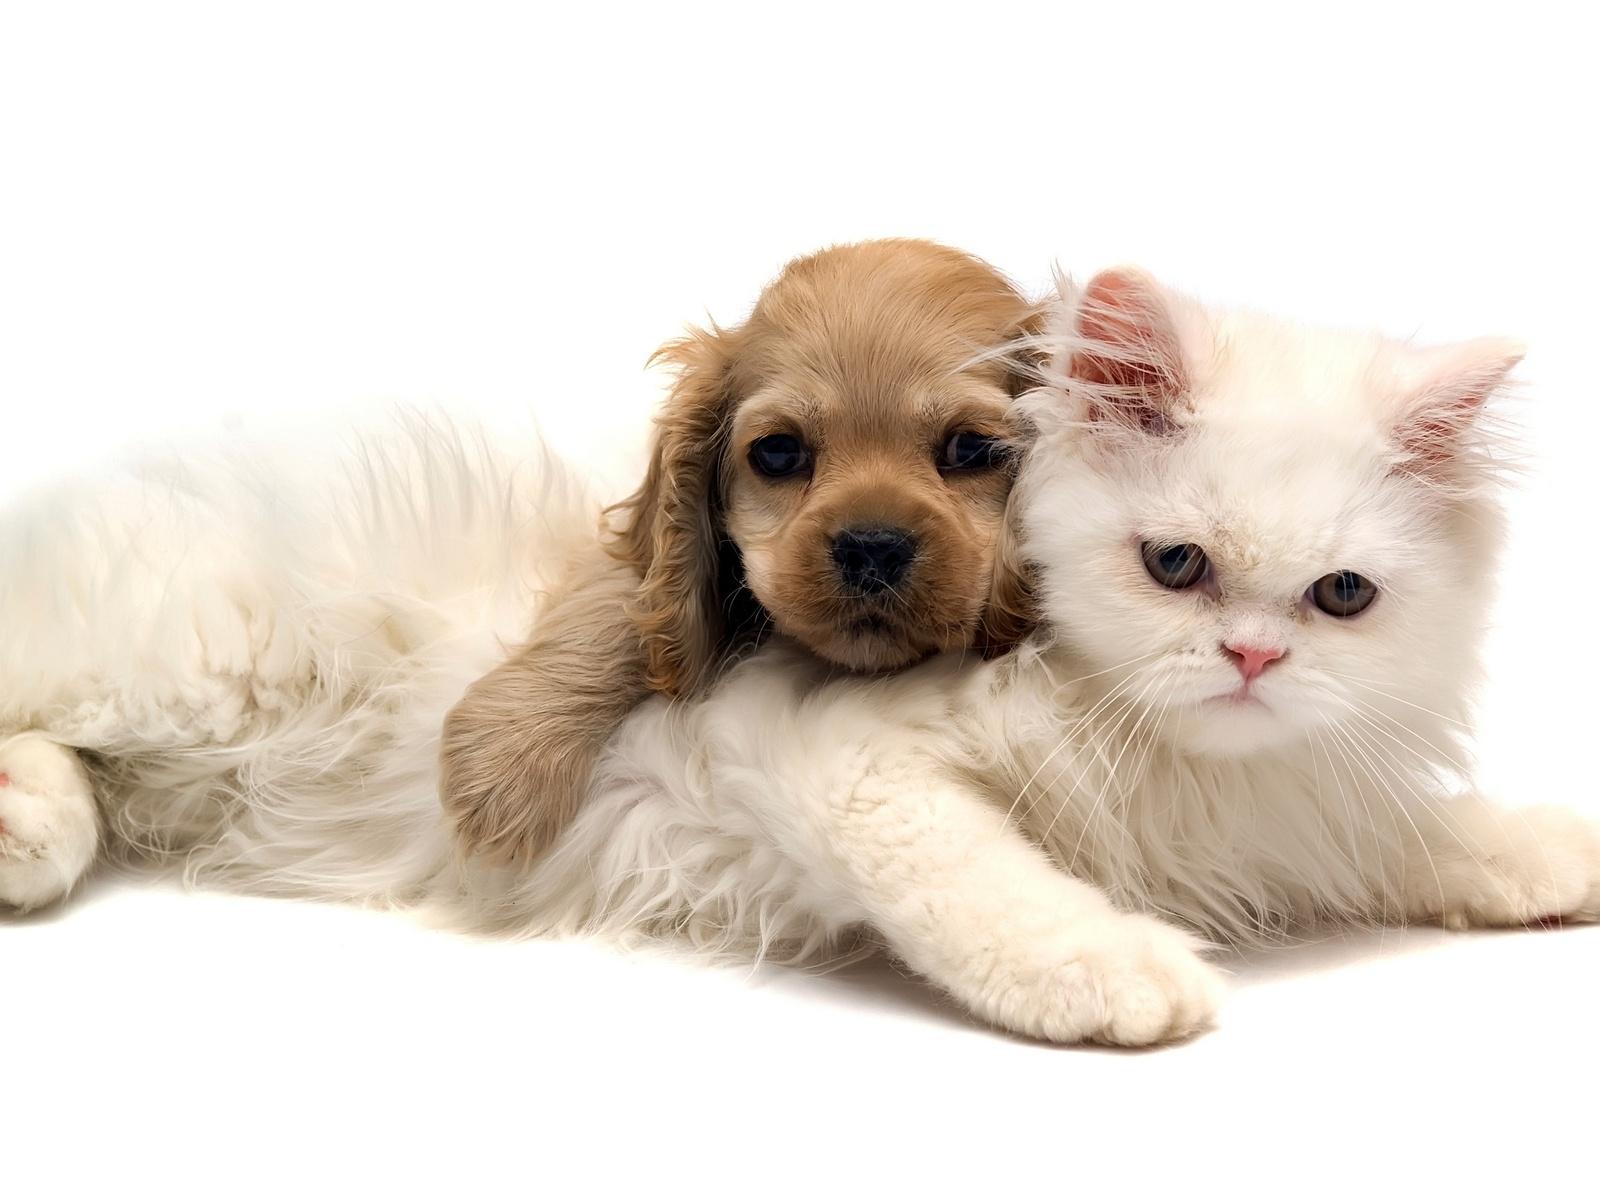 http://4.bp.blogspot.com/-K9gAxxMA-jA/Tf5Os3-wvsI/AAAAAAAAAOA/-5vuBq3lmMw/s1600/Cat%2BAnd%2BDog%2BHD%2BWallpaper.jpg